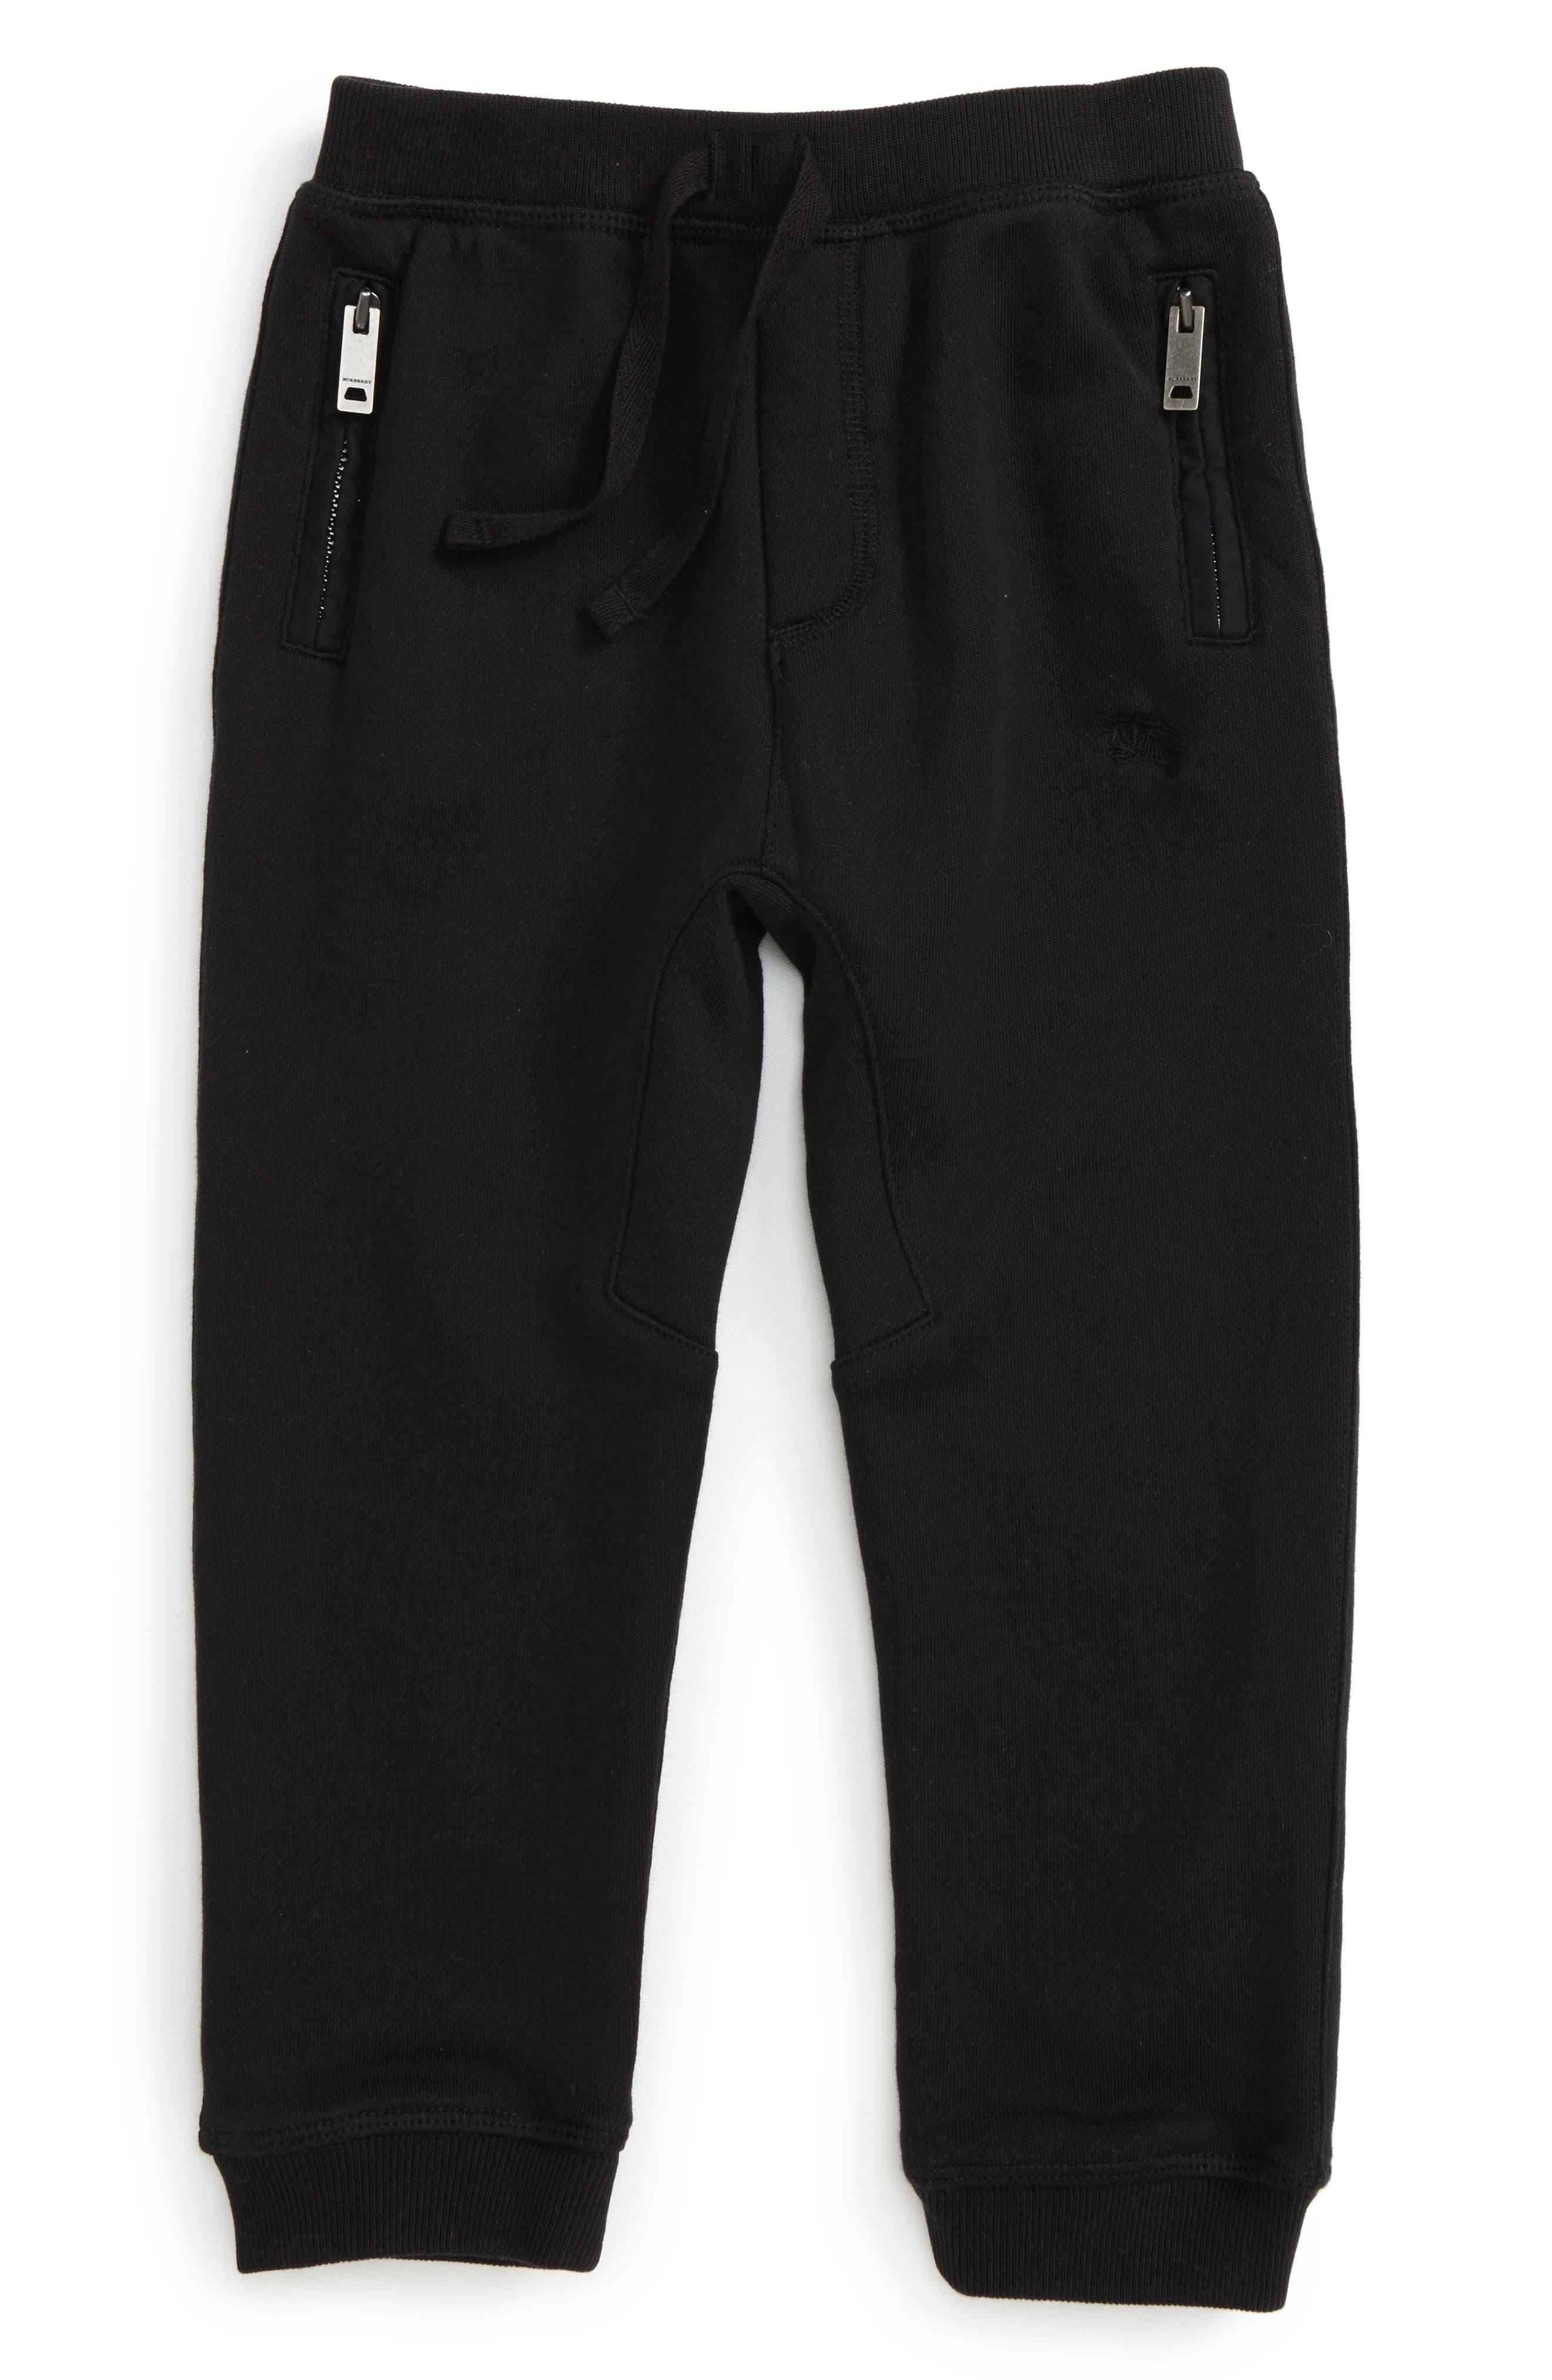 Burberry 'Mini Phill' Sweatpants (Toddler Boys, Little Boys & Big Boys)